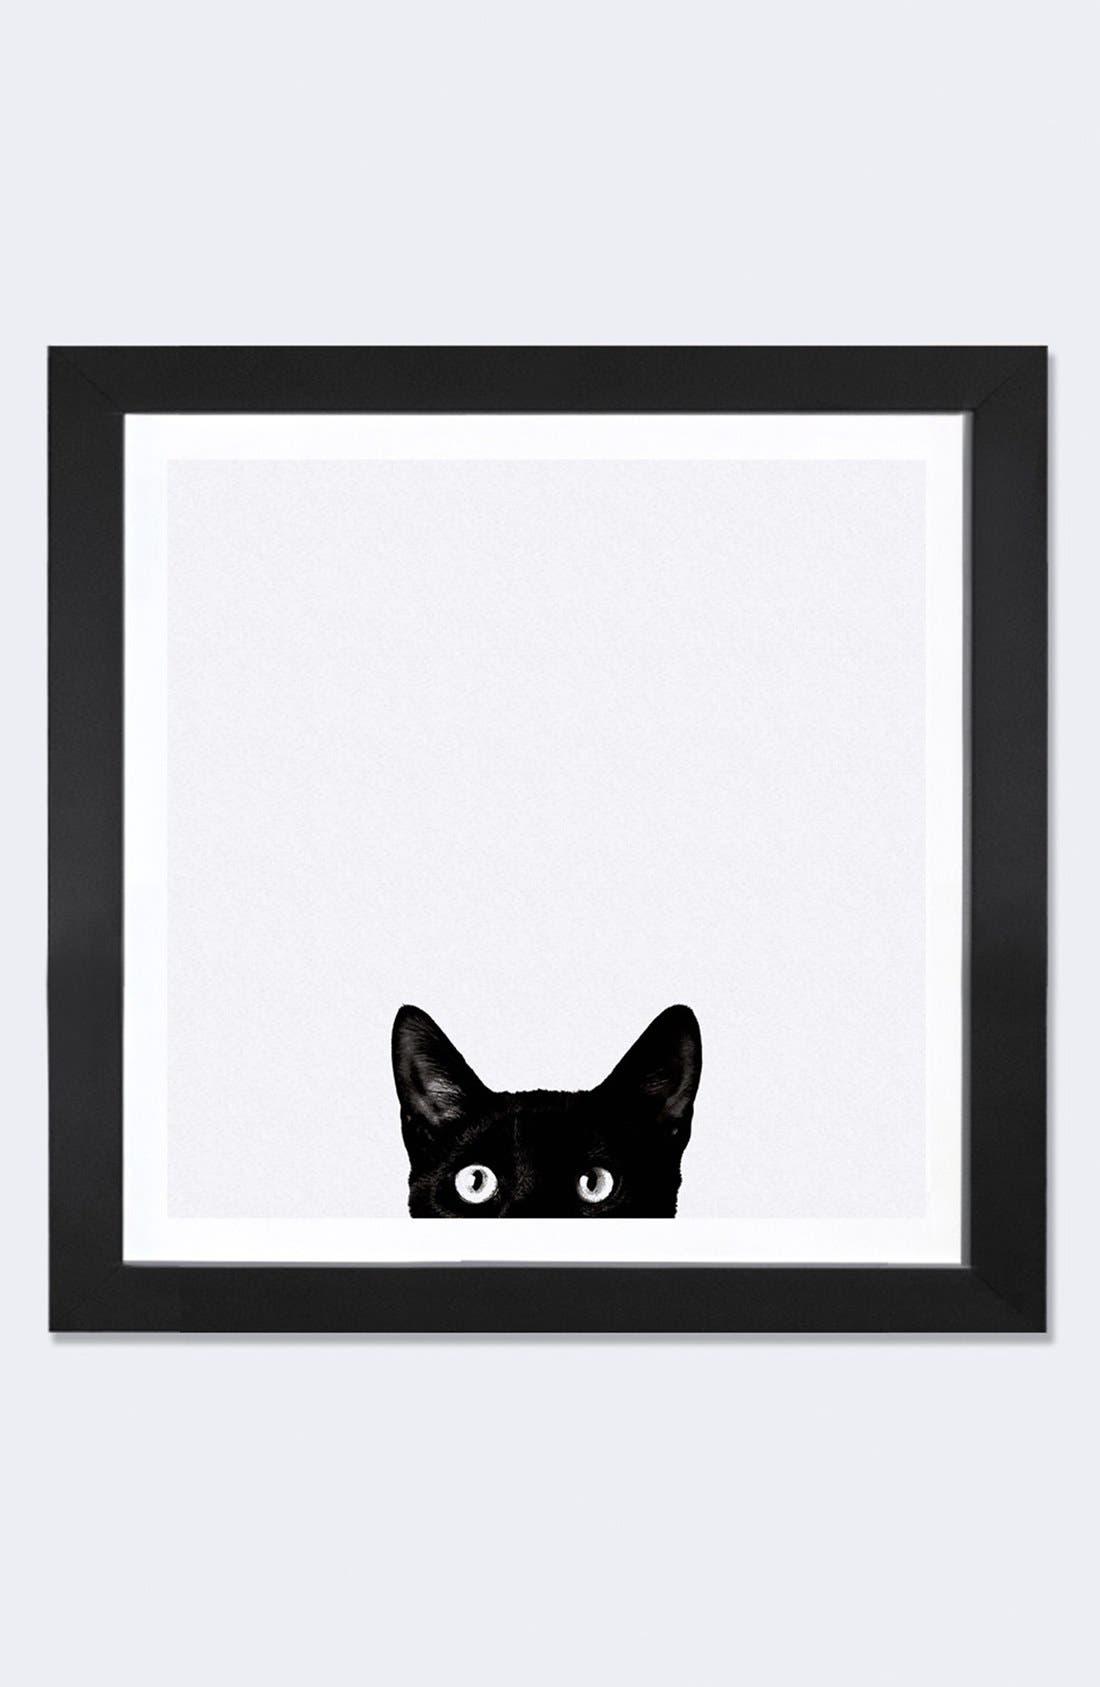 Alternate Image 1 Selected - iCanvas 'Curiosity' Framed Fine Art Print